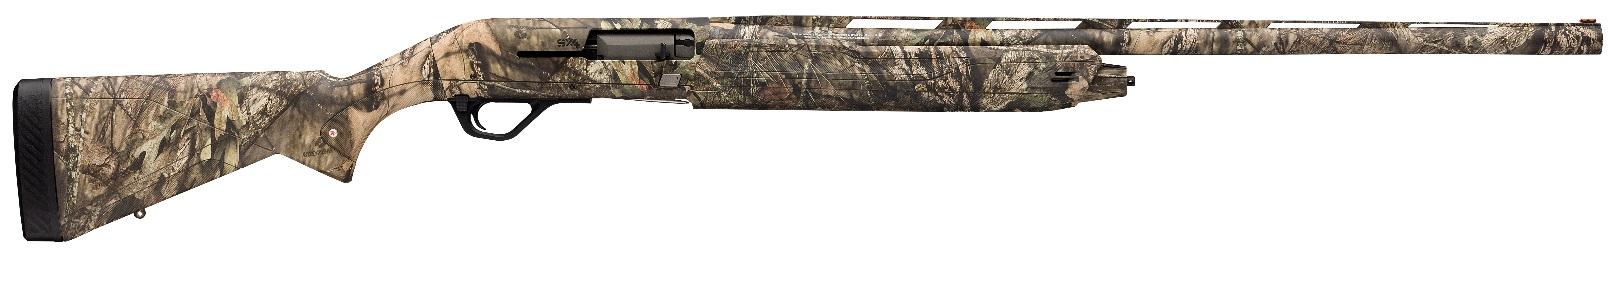 Winchester SX4 Universal Hunter 20 Gauge